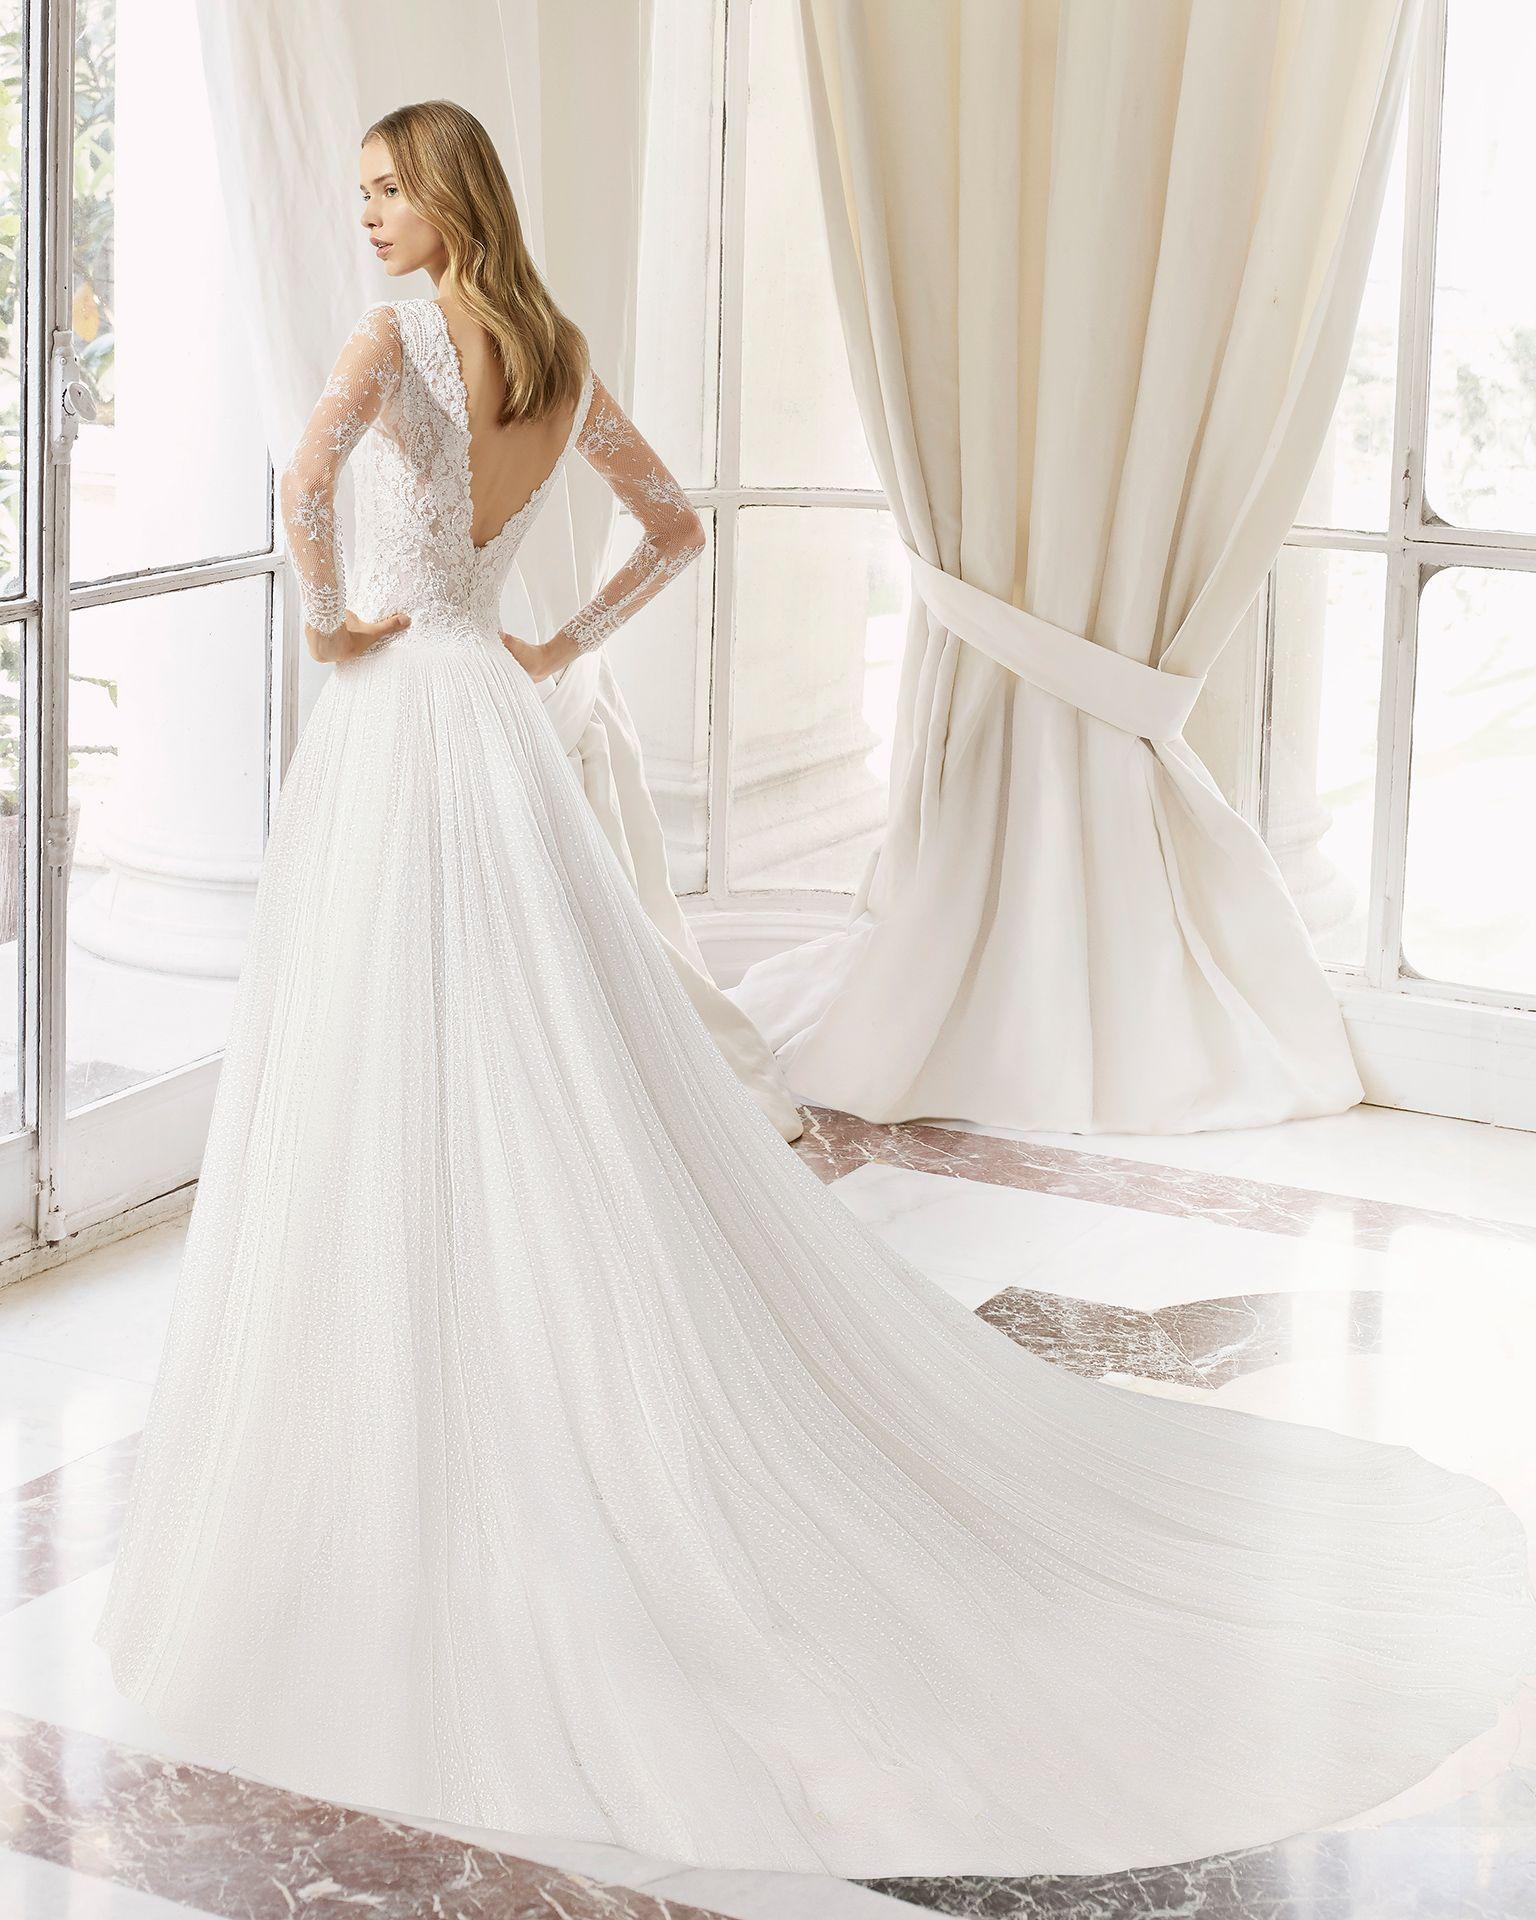 Majestic Wedding Dresses Wedding Dress Sleeves Wedding Dress Long Sleeve [ 1920 x 1536 Pixel ]